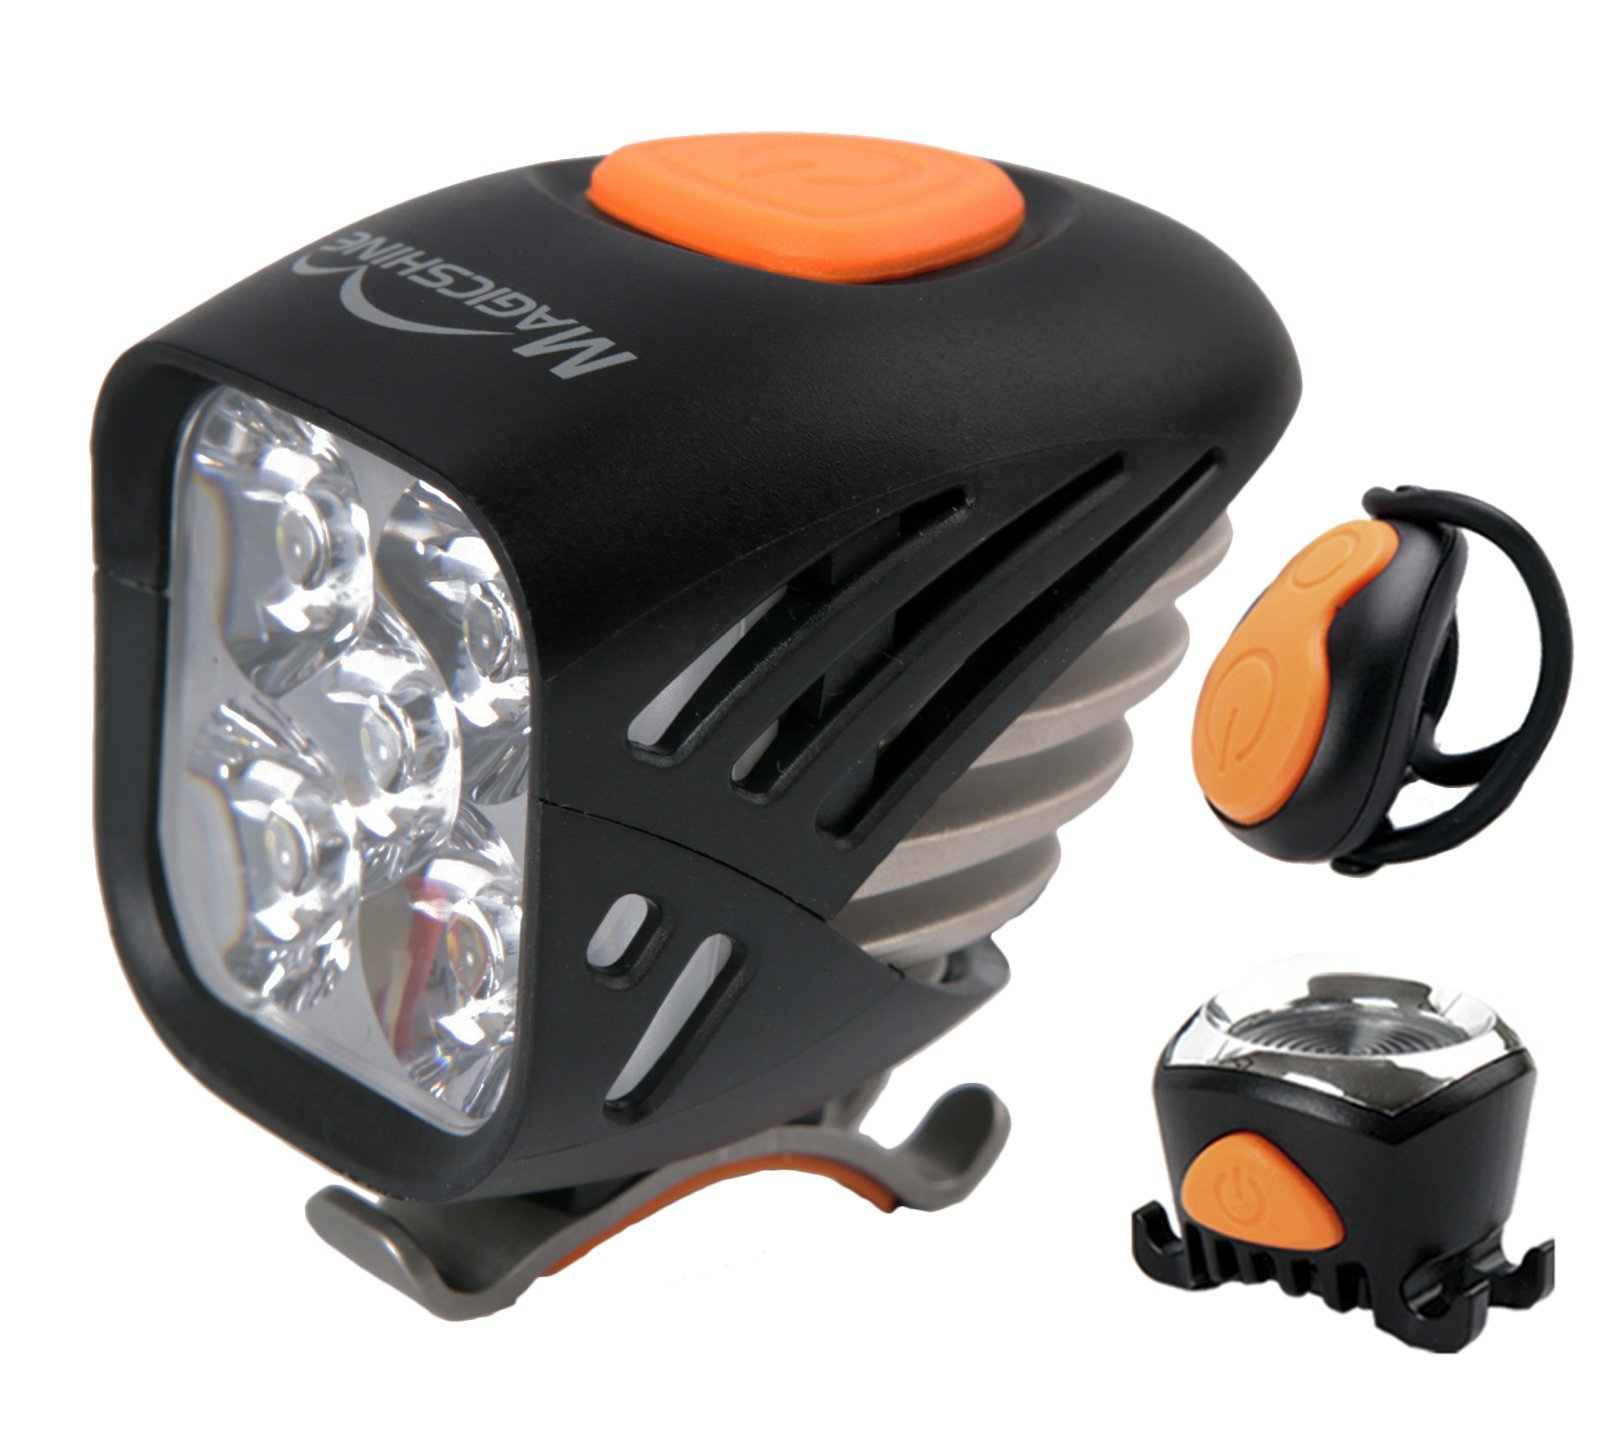 Magicshine MJ 906, High Grade MTB Enduro Bike Light Set, 5000 Lumens of Max output. Wireless Remote Bicycle Lights Front And Rear Combo, LED Bike Tail Light, Perfect Beam Pattern Bright Bike Light